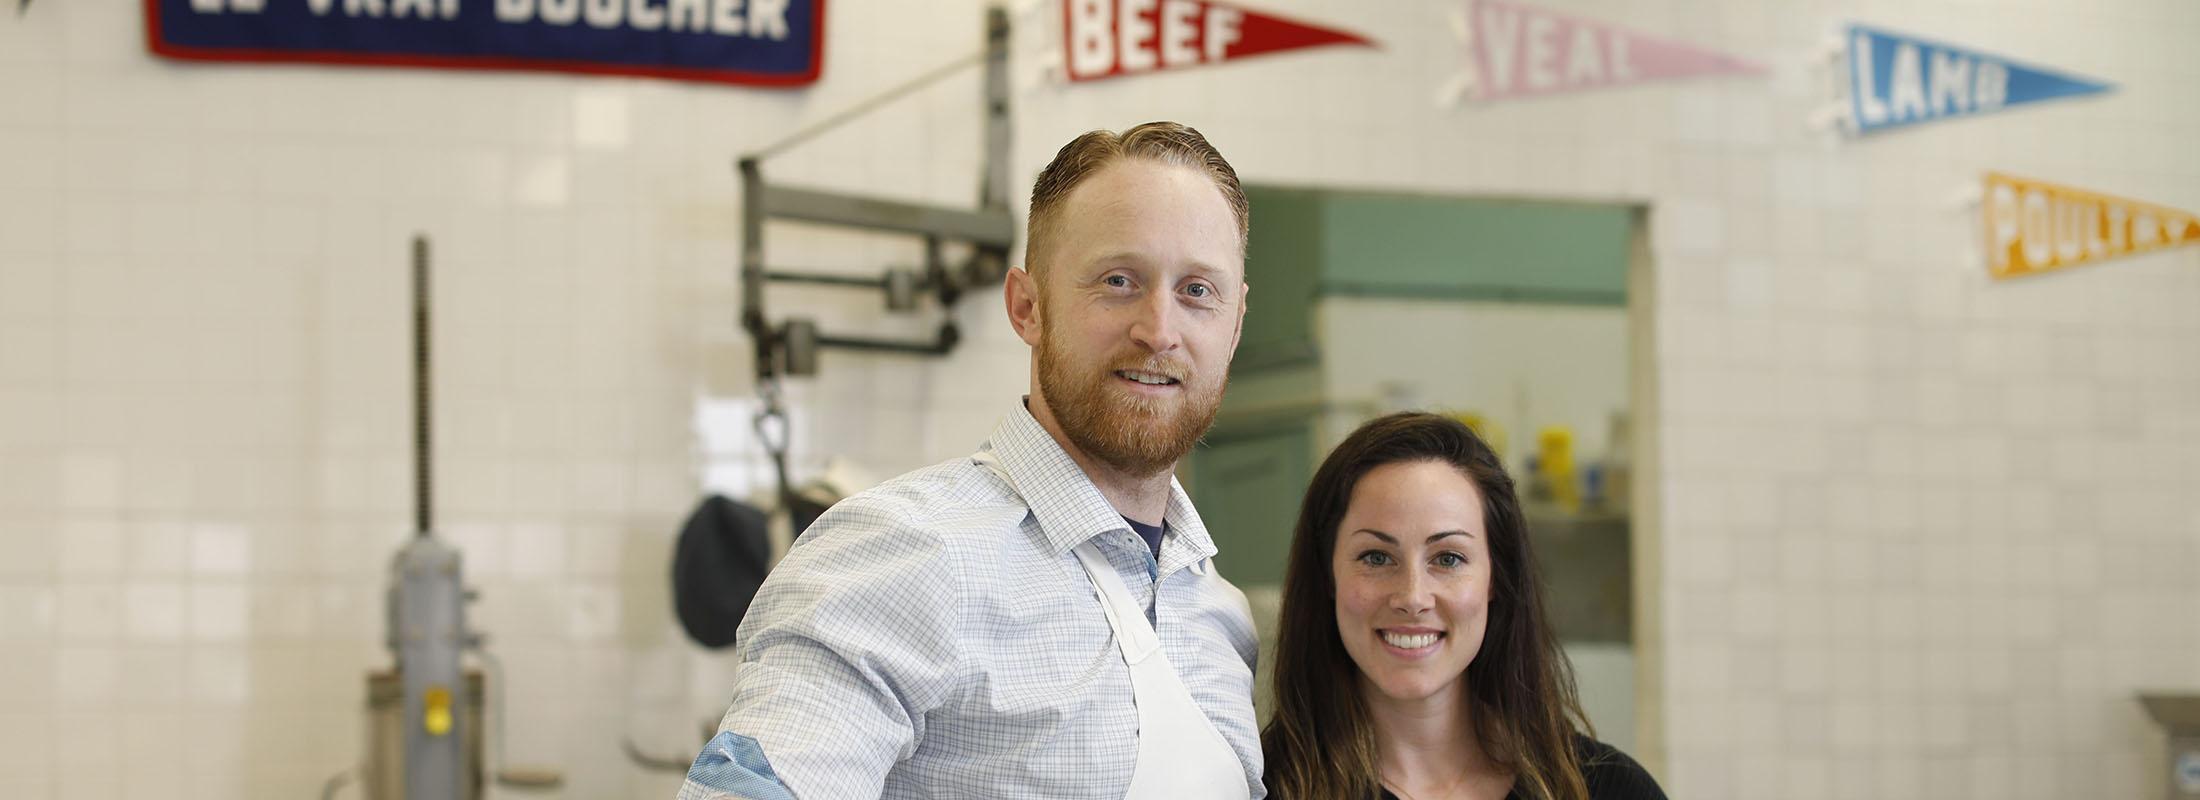 Thomas and Caitlin Moriarty run Moriarty Meats on Grant Street. (Derek Gee/Buffalo News)